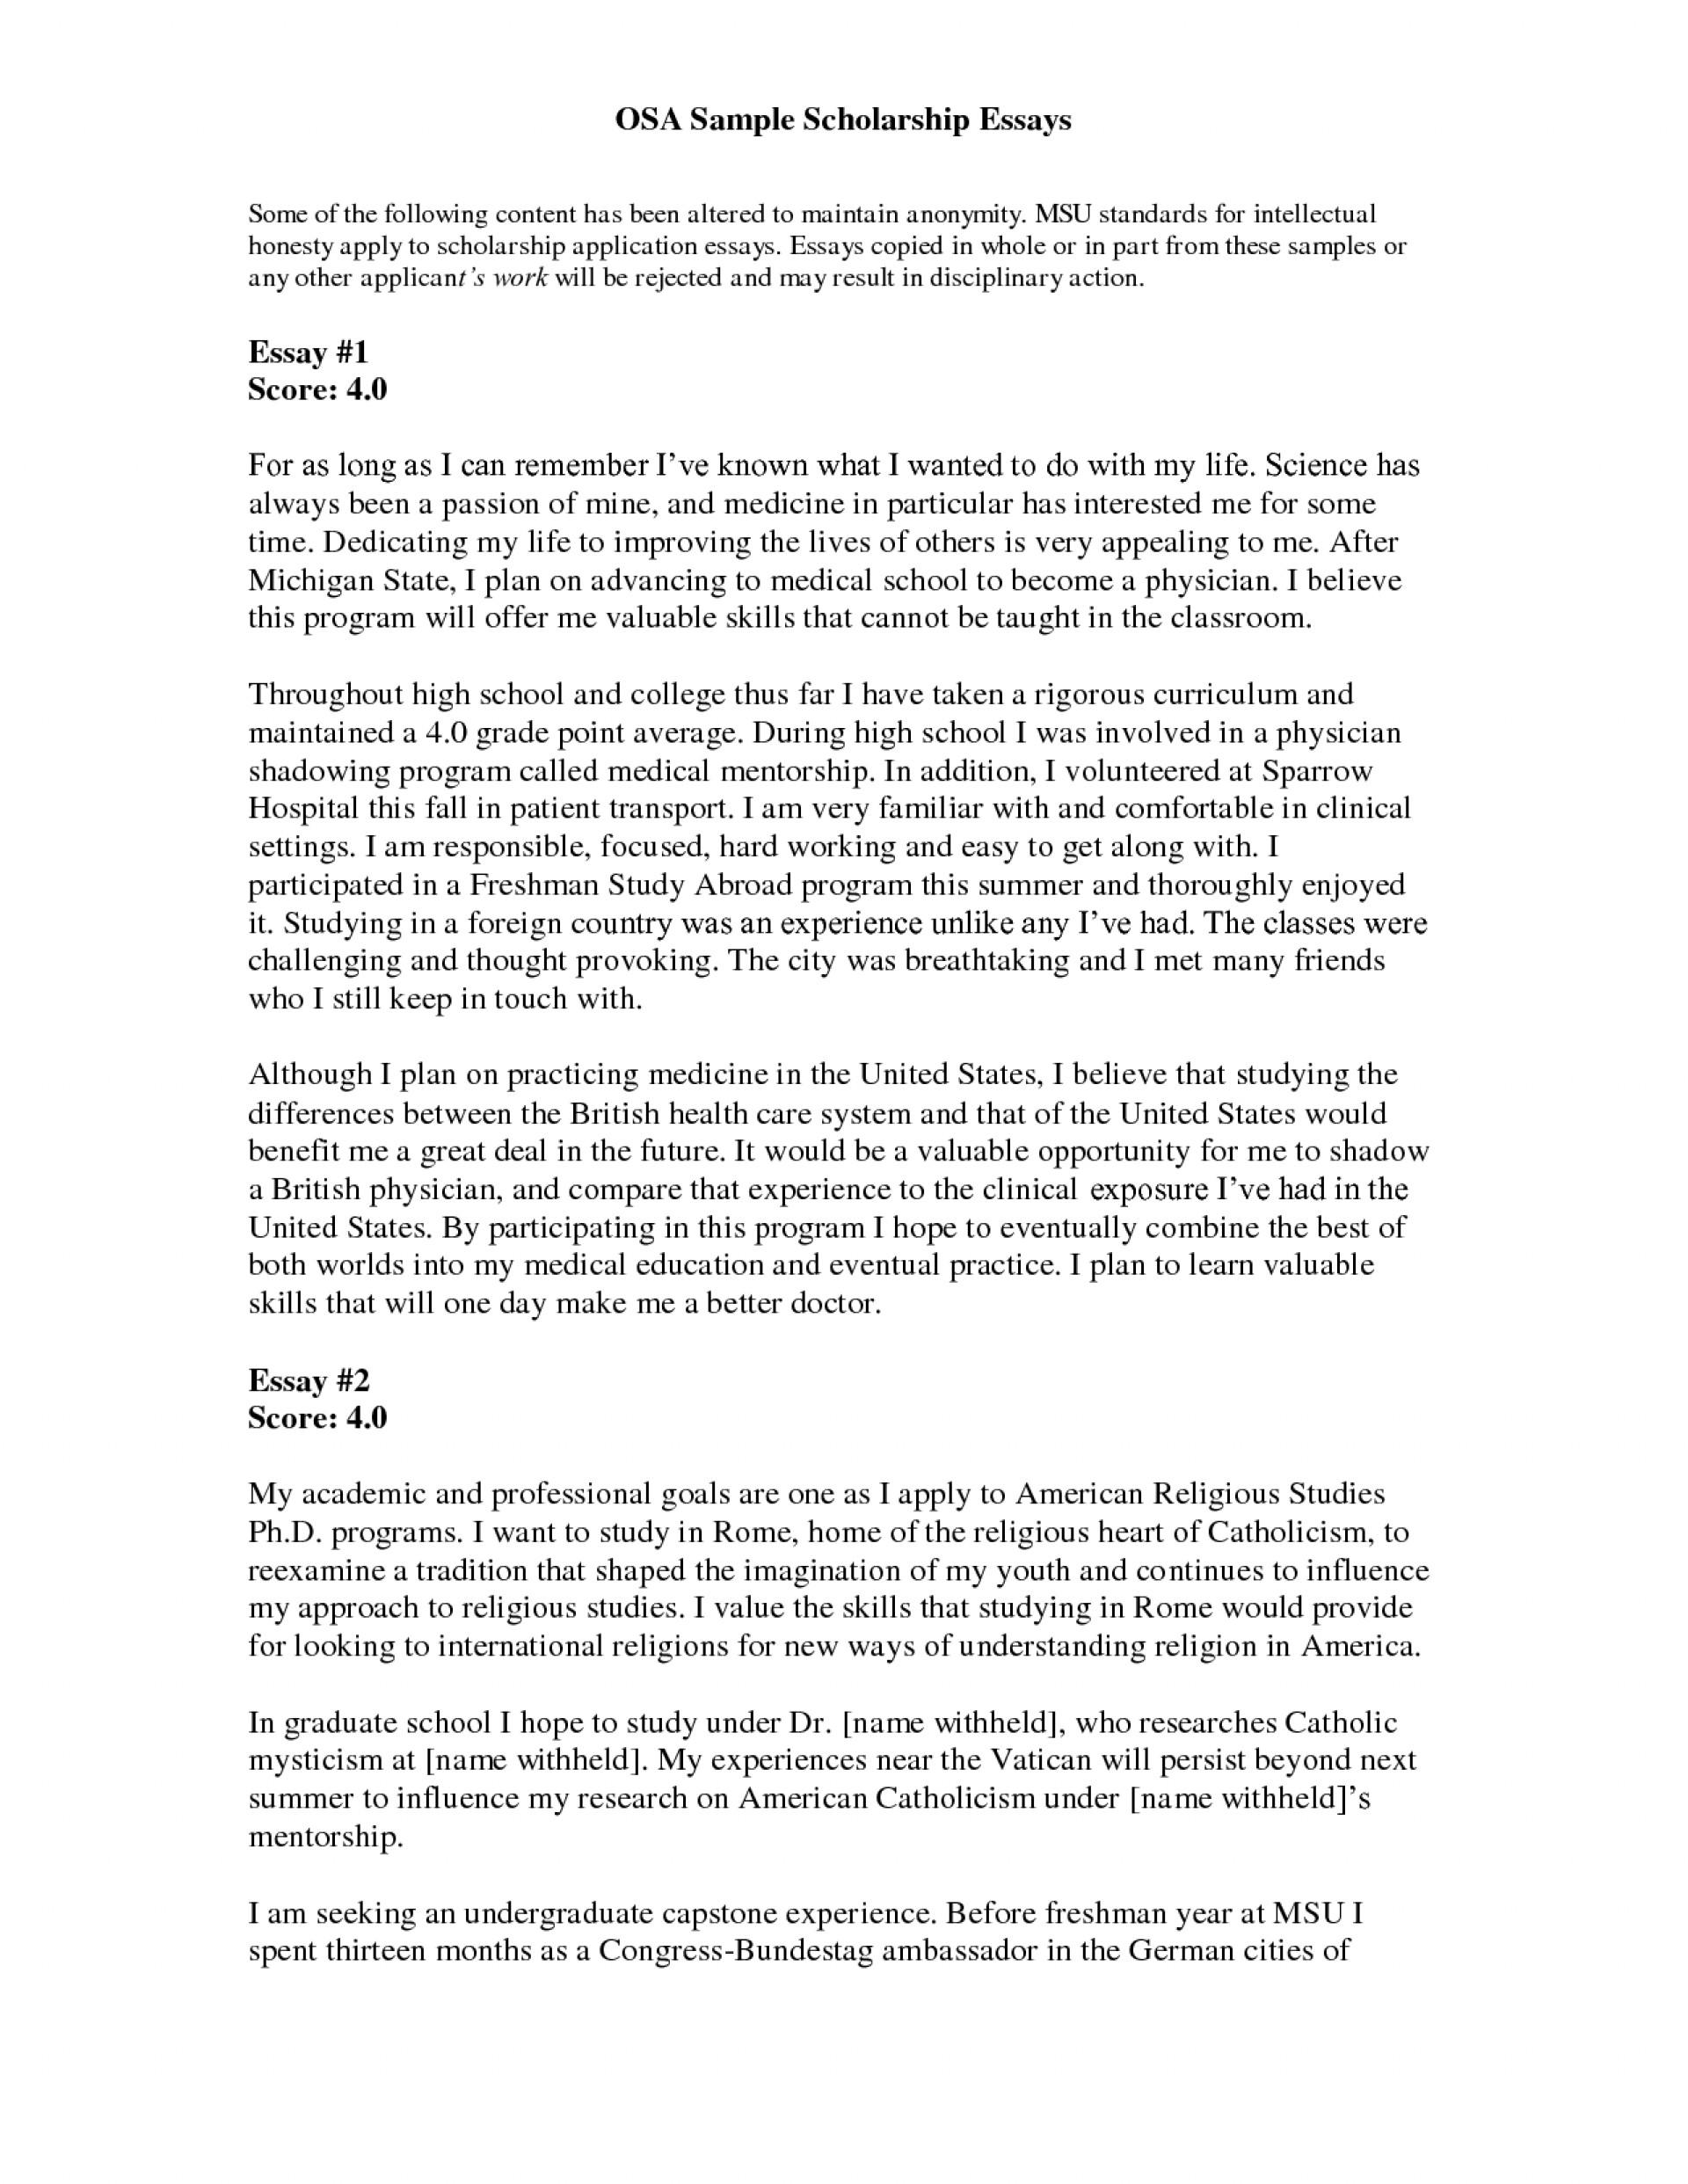 003 Uvs74i83av Scholarships Essay Singular Centralis Scholarship Topics Chevening Tips About Yourself 1920